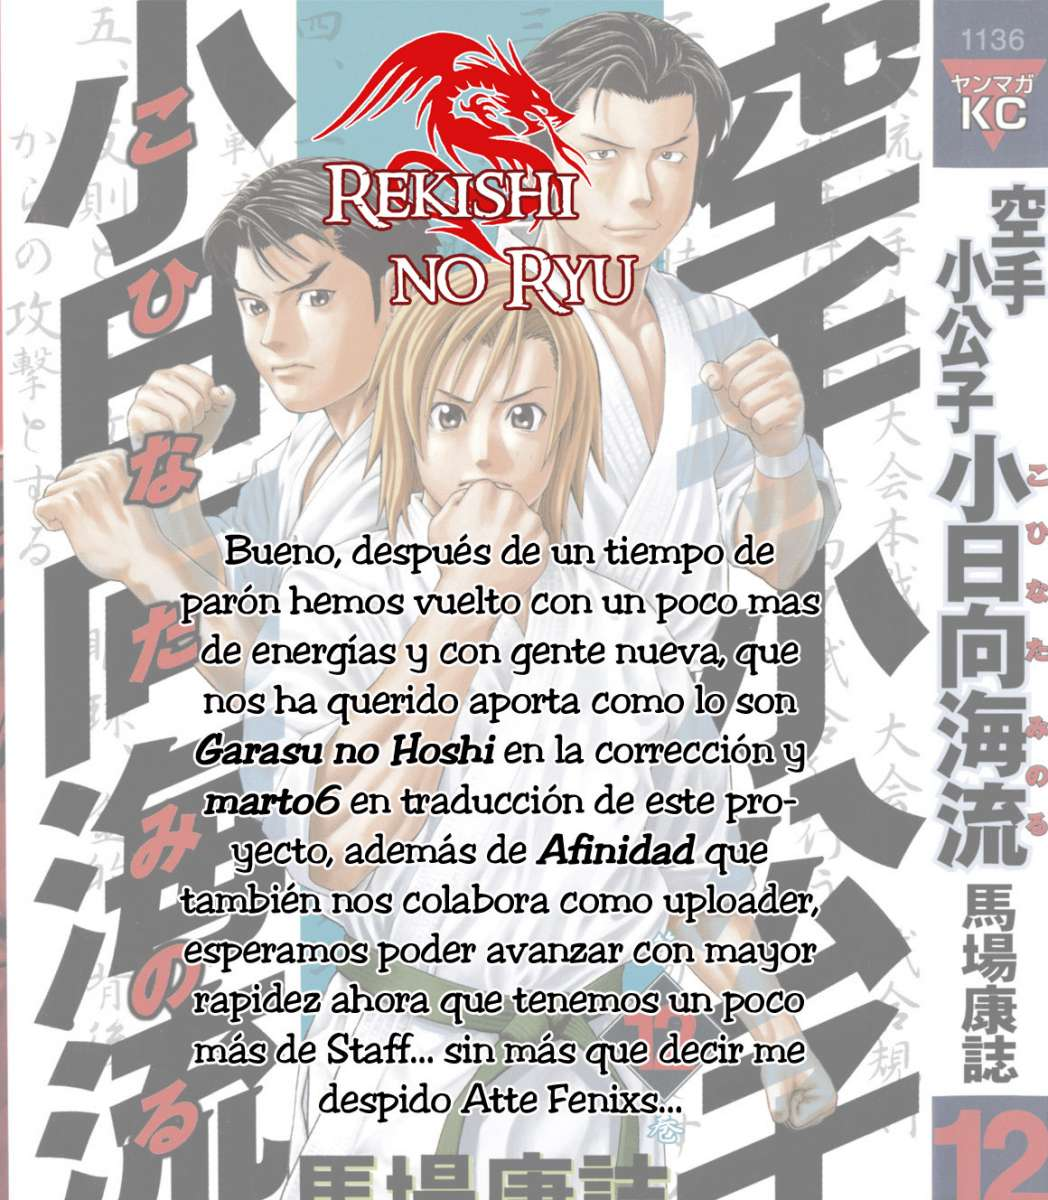 http://c5.ninemanga.com/es_manga/53/501/274275/de517cde31ed97ac4c1d35a3f0e055ea.jpg Page 2